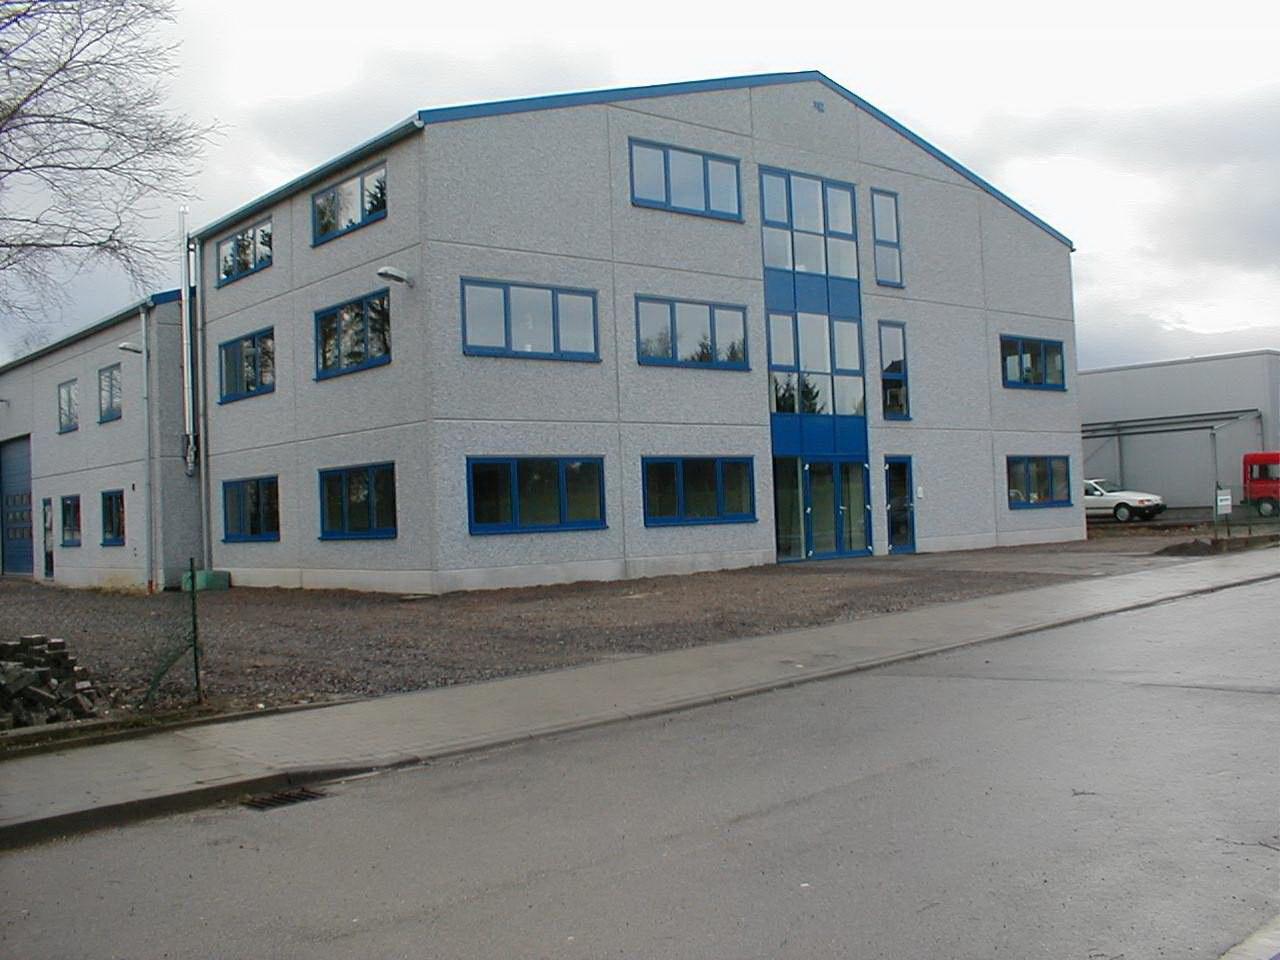 Neubau Pontsheide 36 (Architekt Hofmeister) 2000